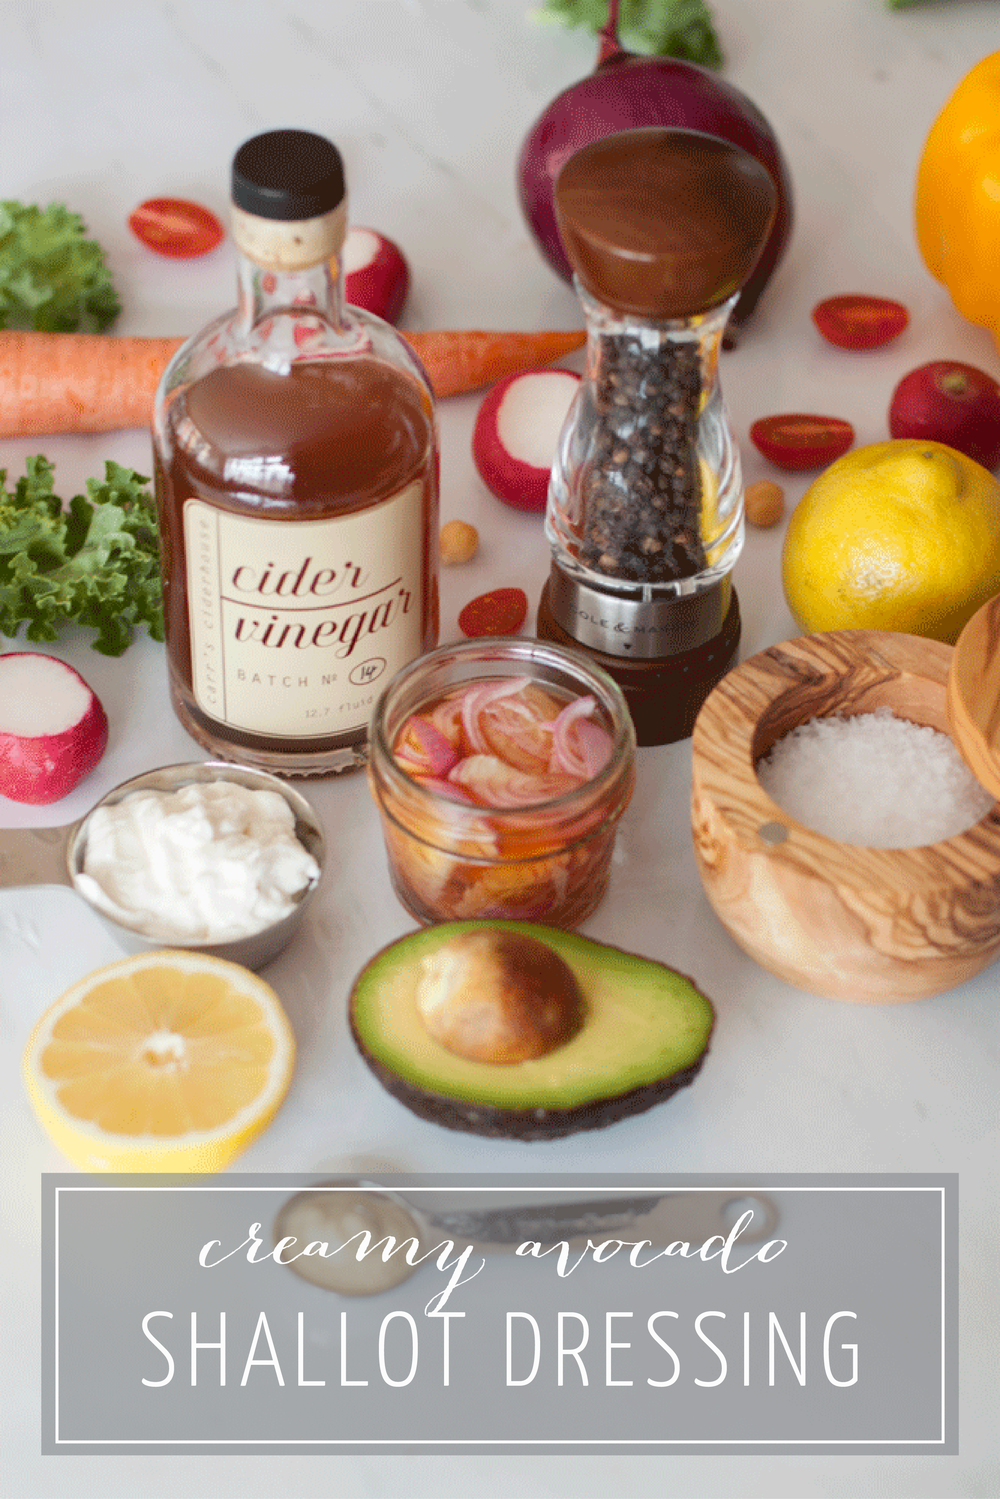 Recipe for Creamy Avocado Shallot Dressing - Bubbles in Bucktown (bubblesinbucktown.com)